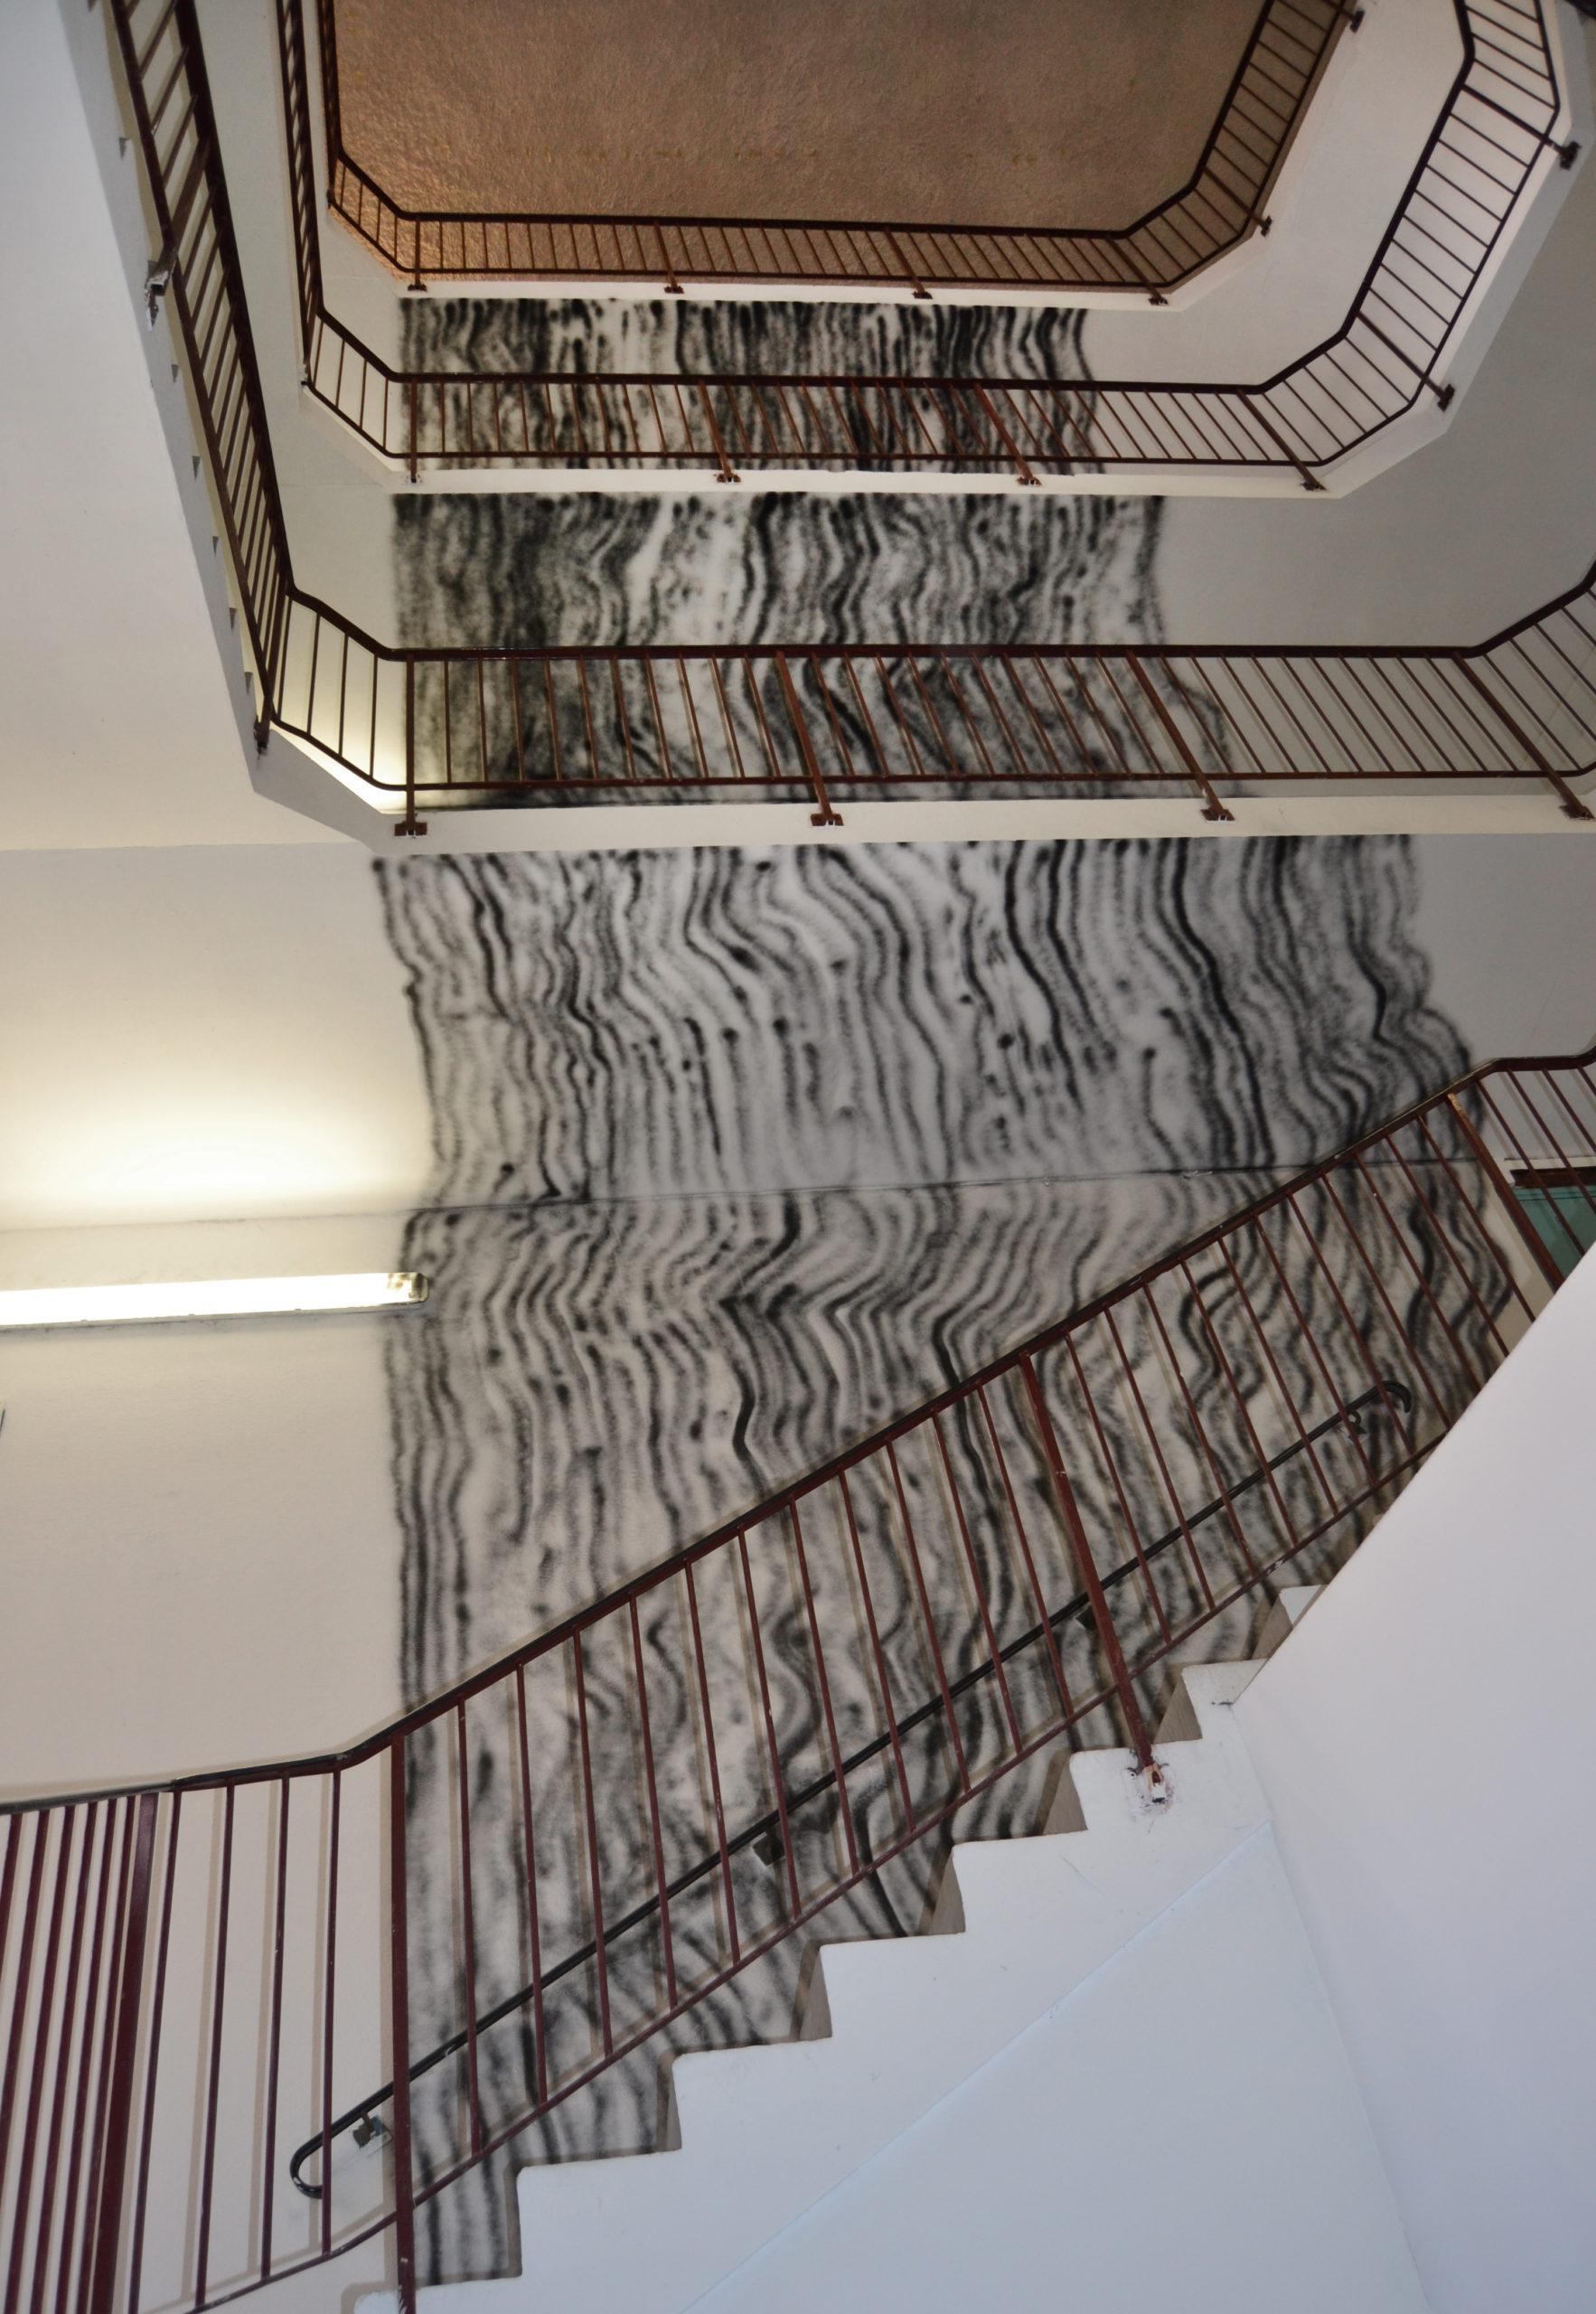 Peinture Escalier Noir Mat in-situ | julien nicolas artiste plasticien